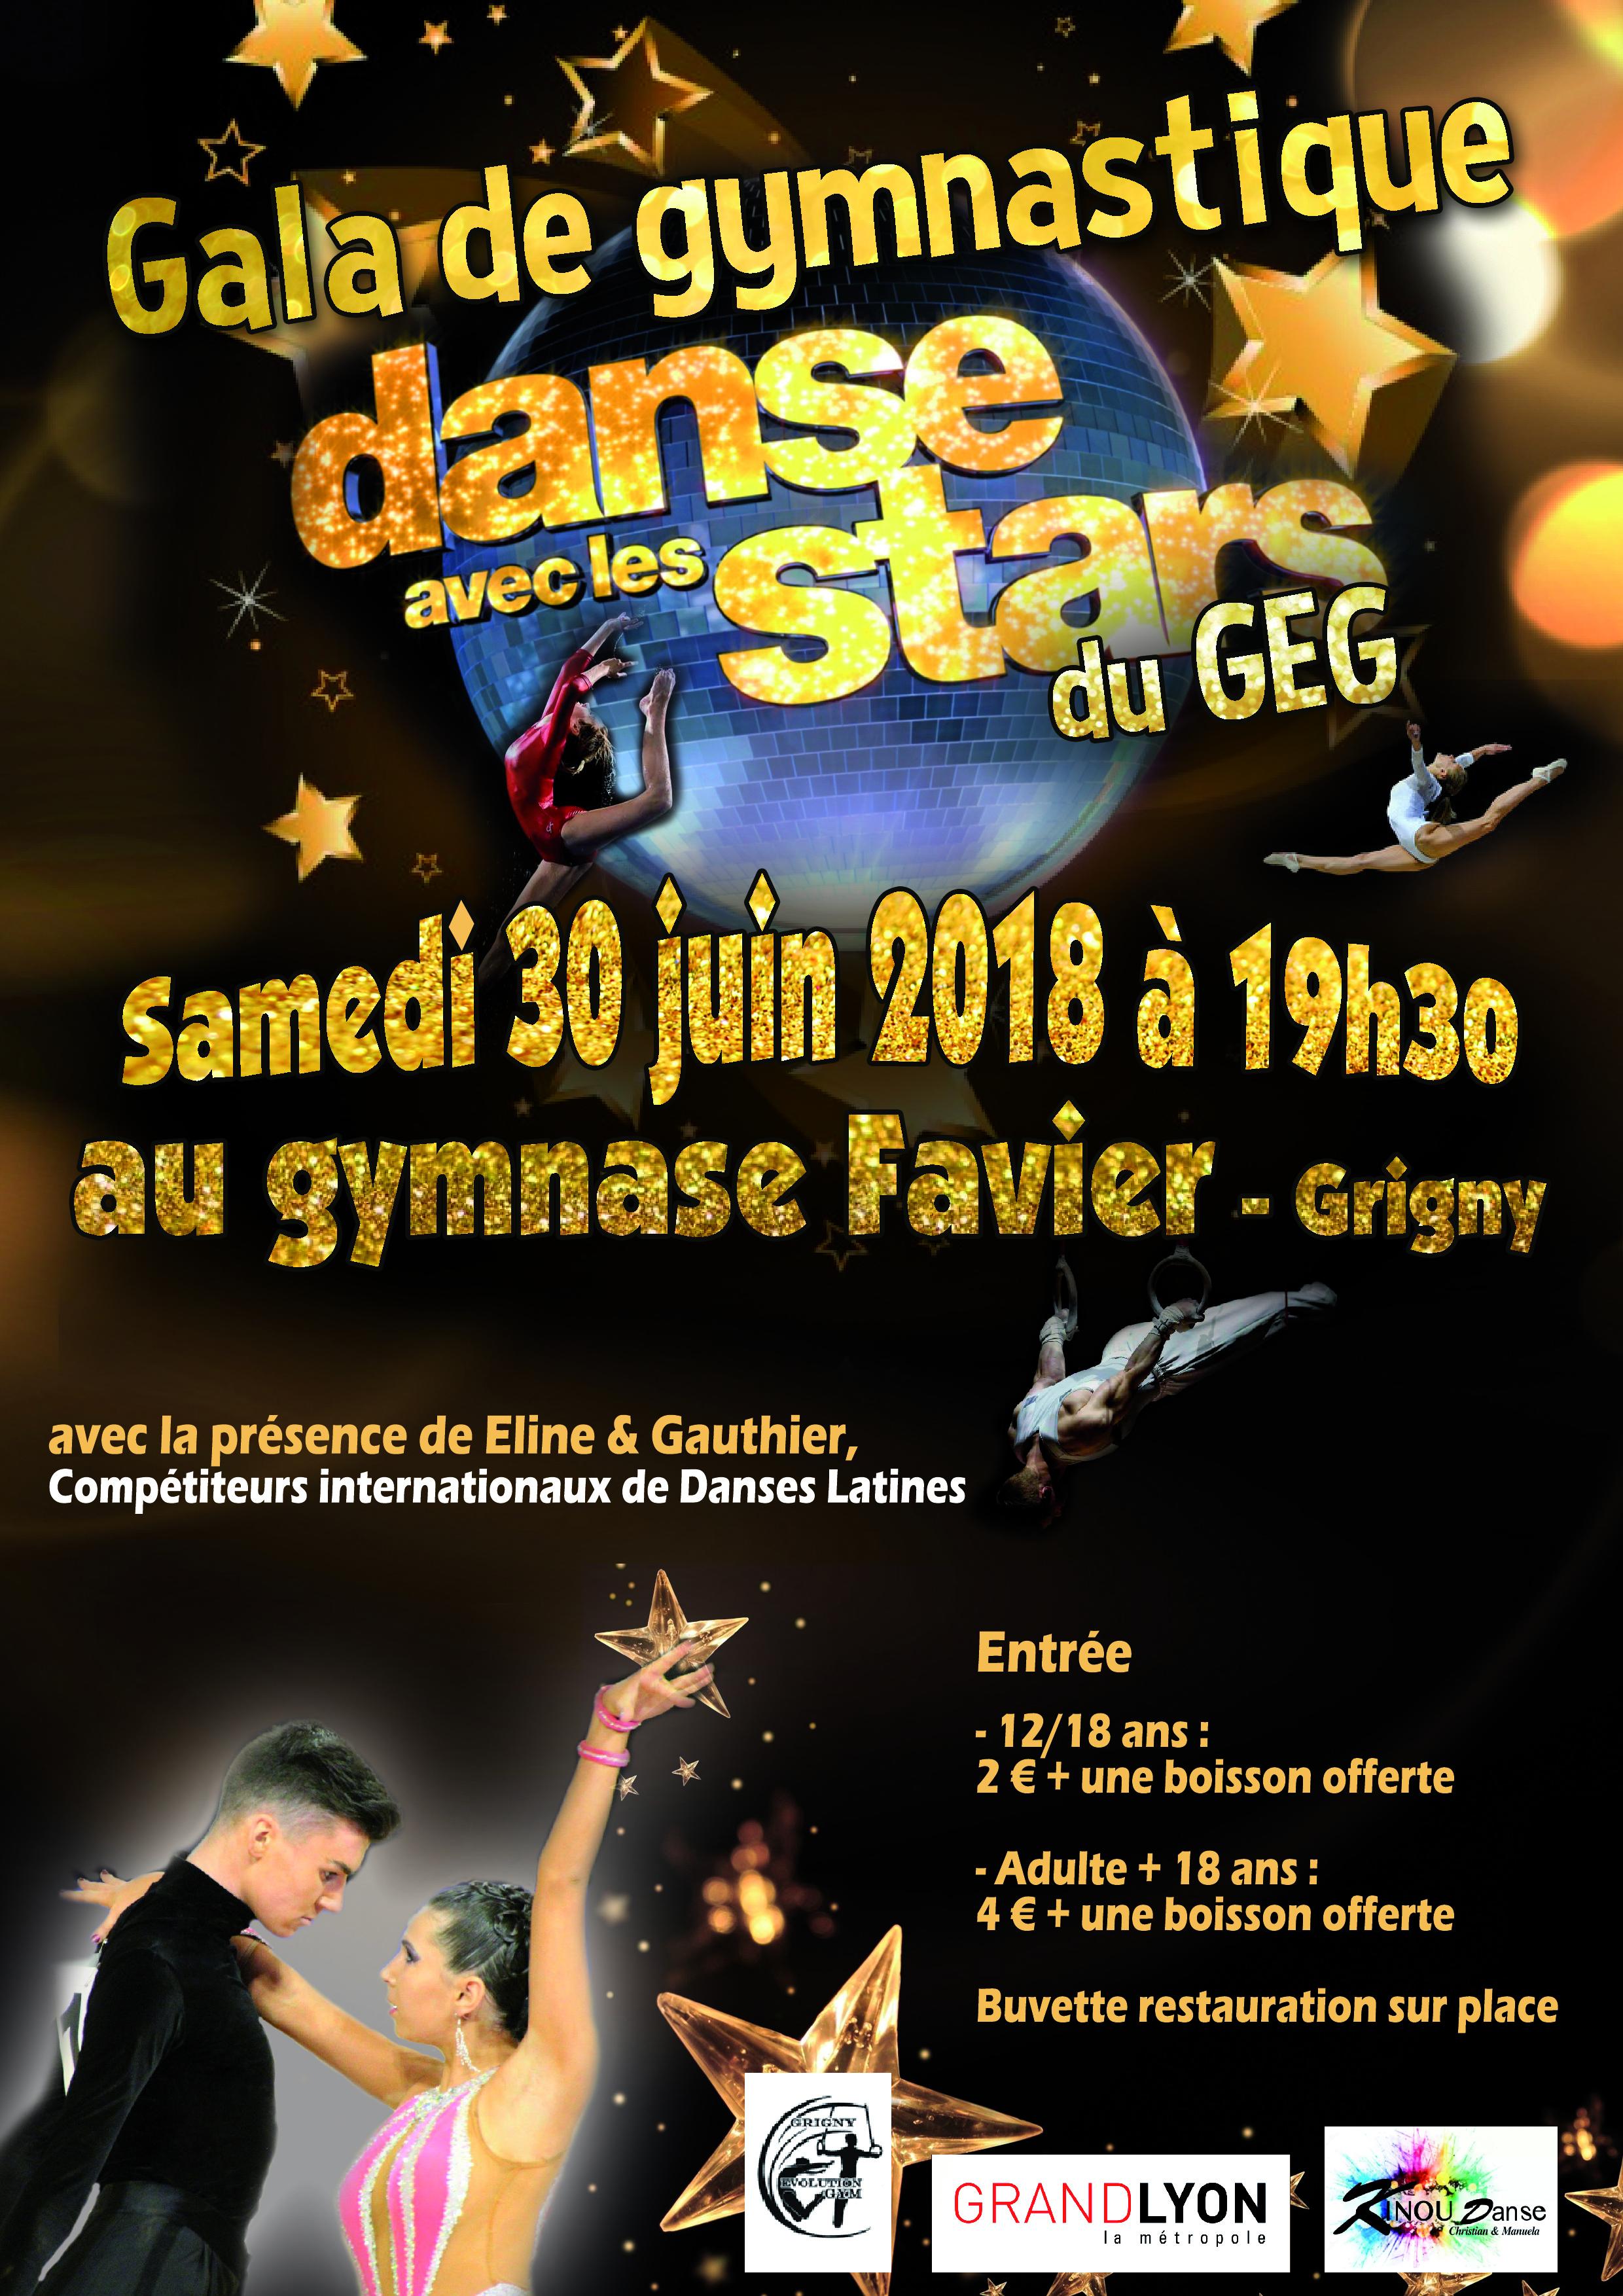 Gala de fin d'année samedi 30 juin 2018